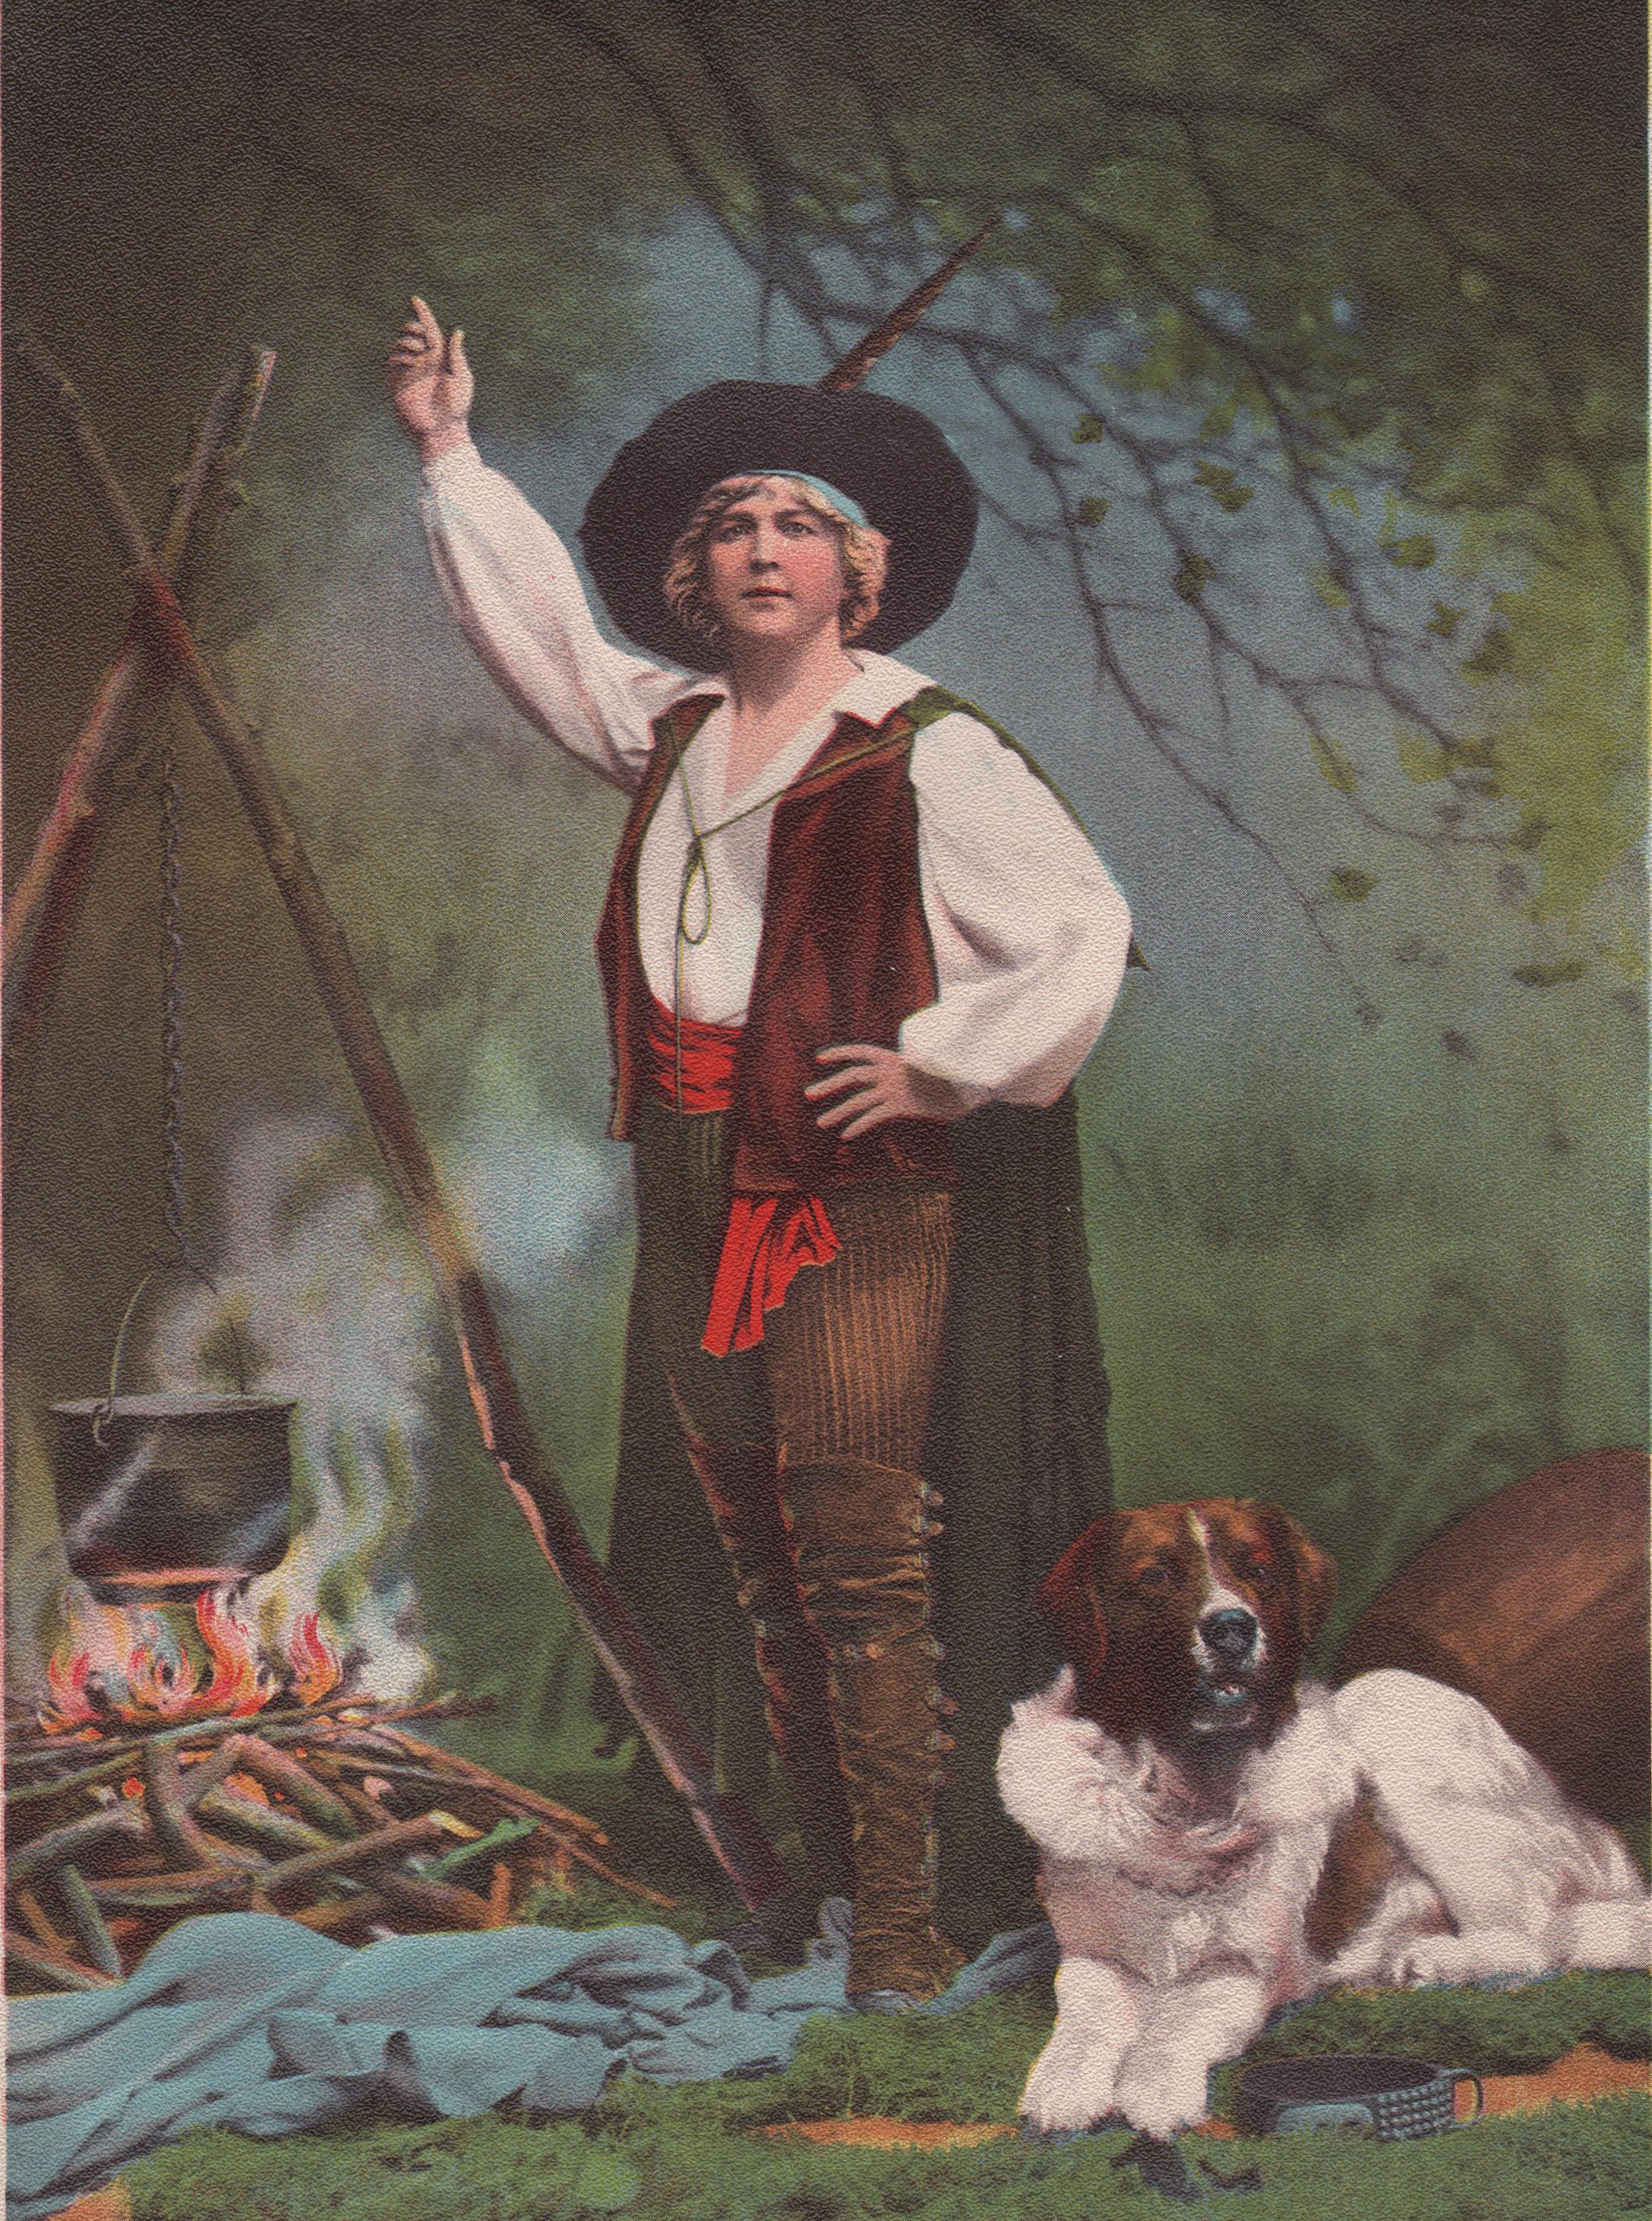 Opera and Theatre stars of the late 19th century (circa 1899)